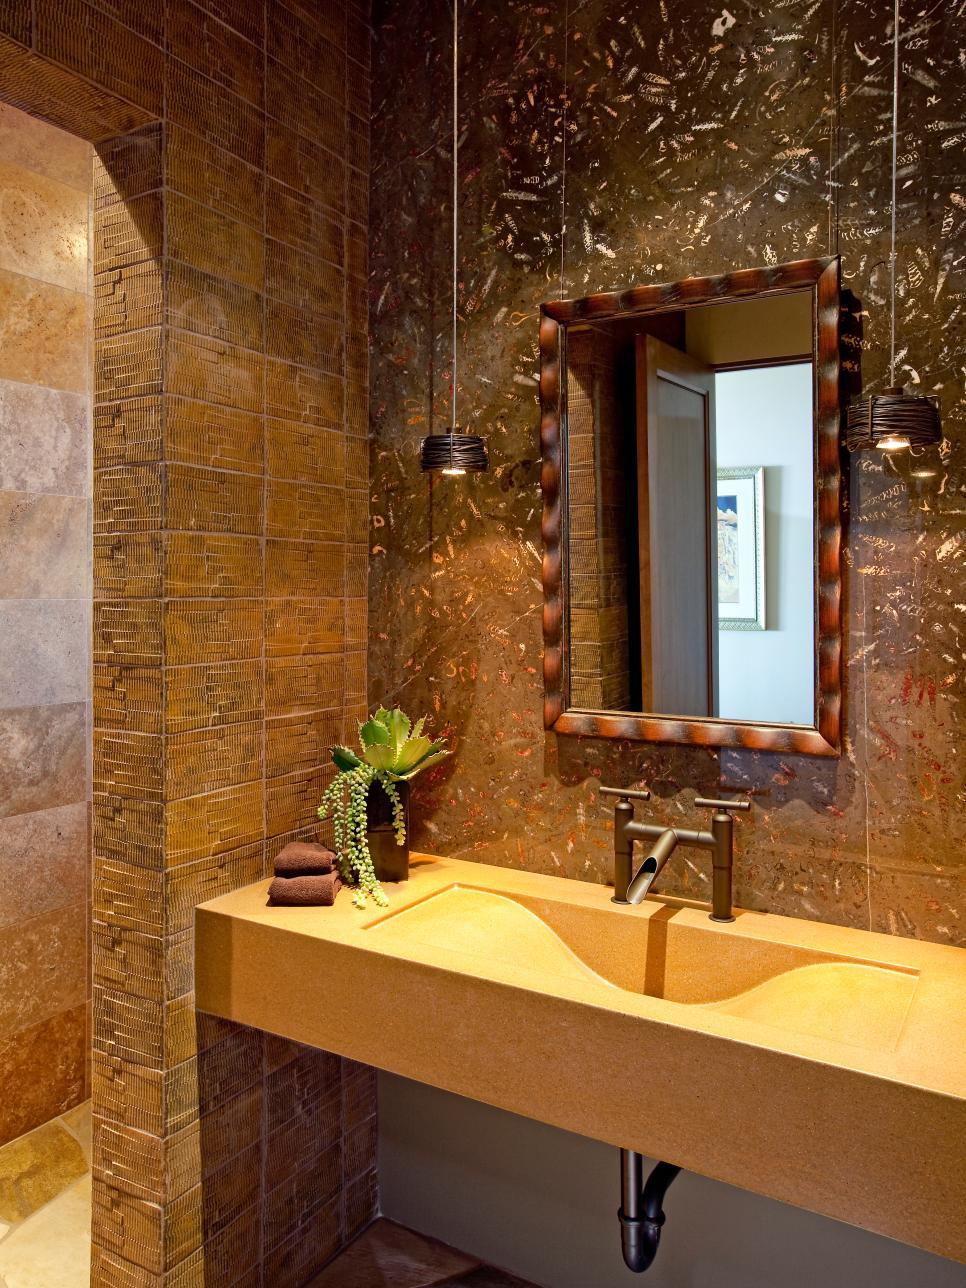 20 ideas for bathroom wall color diy for Marrakech bathroom design